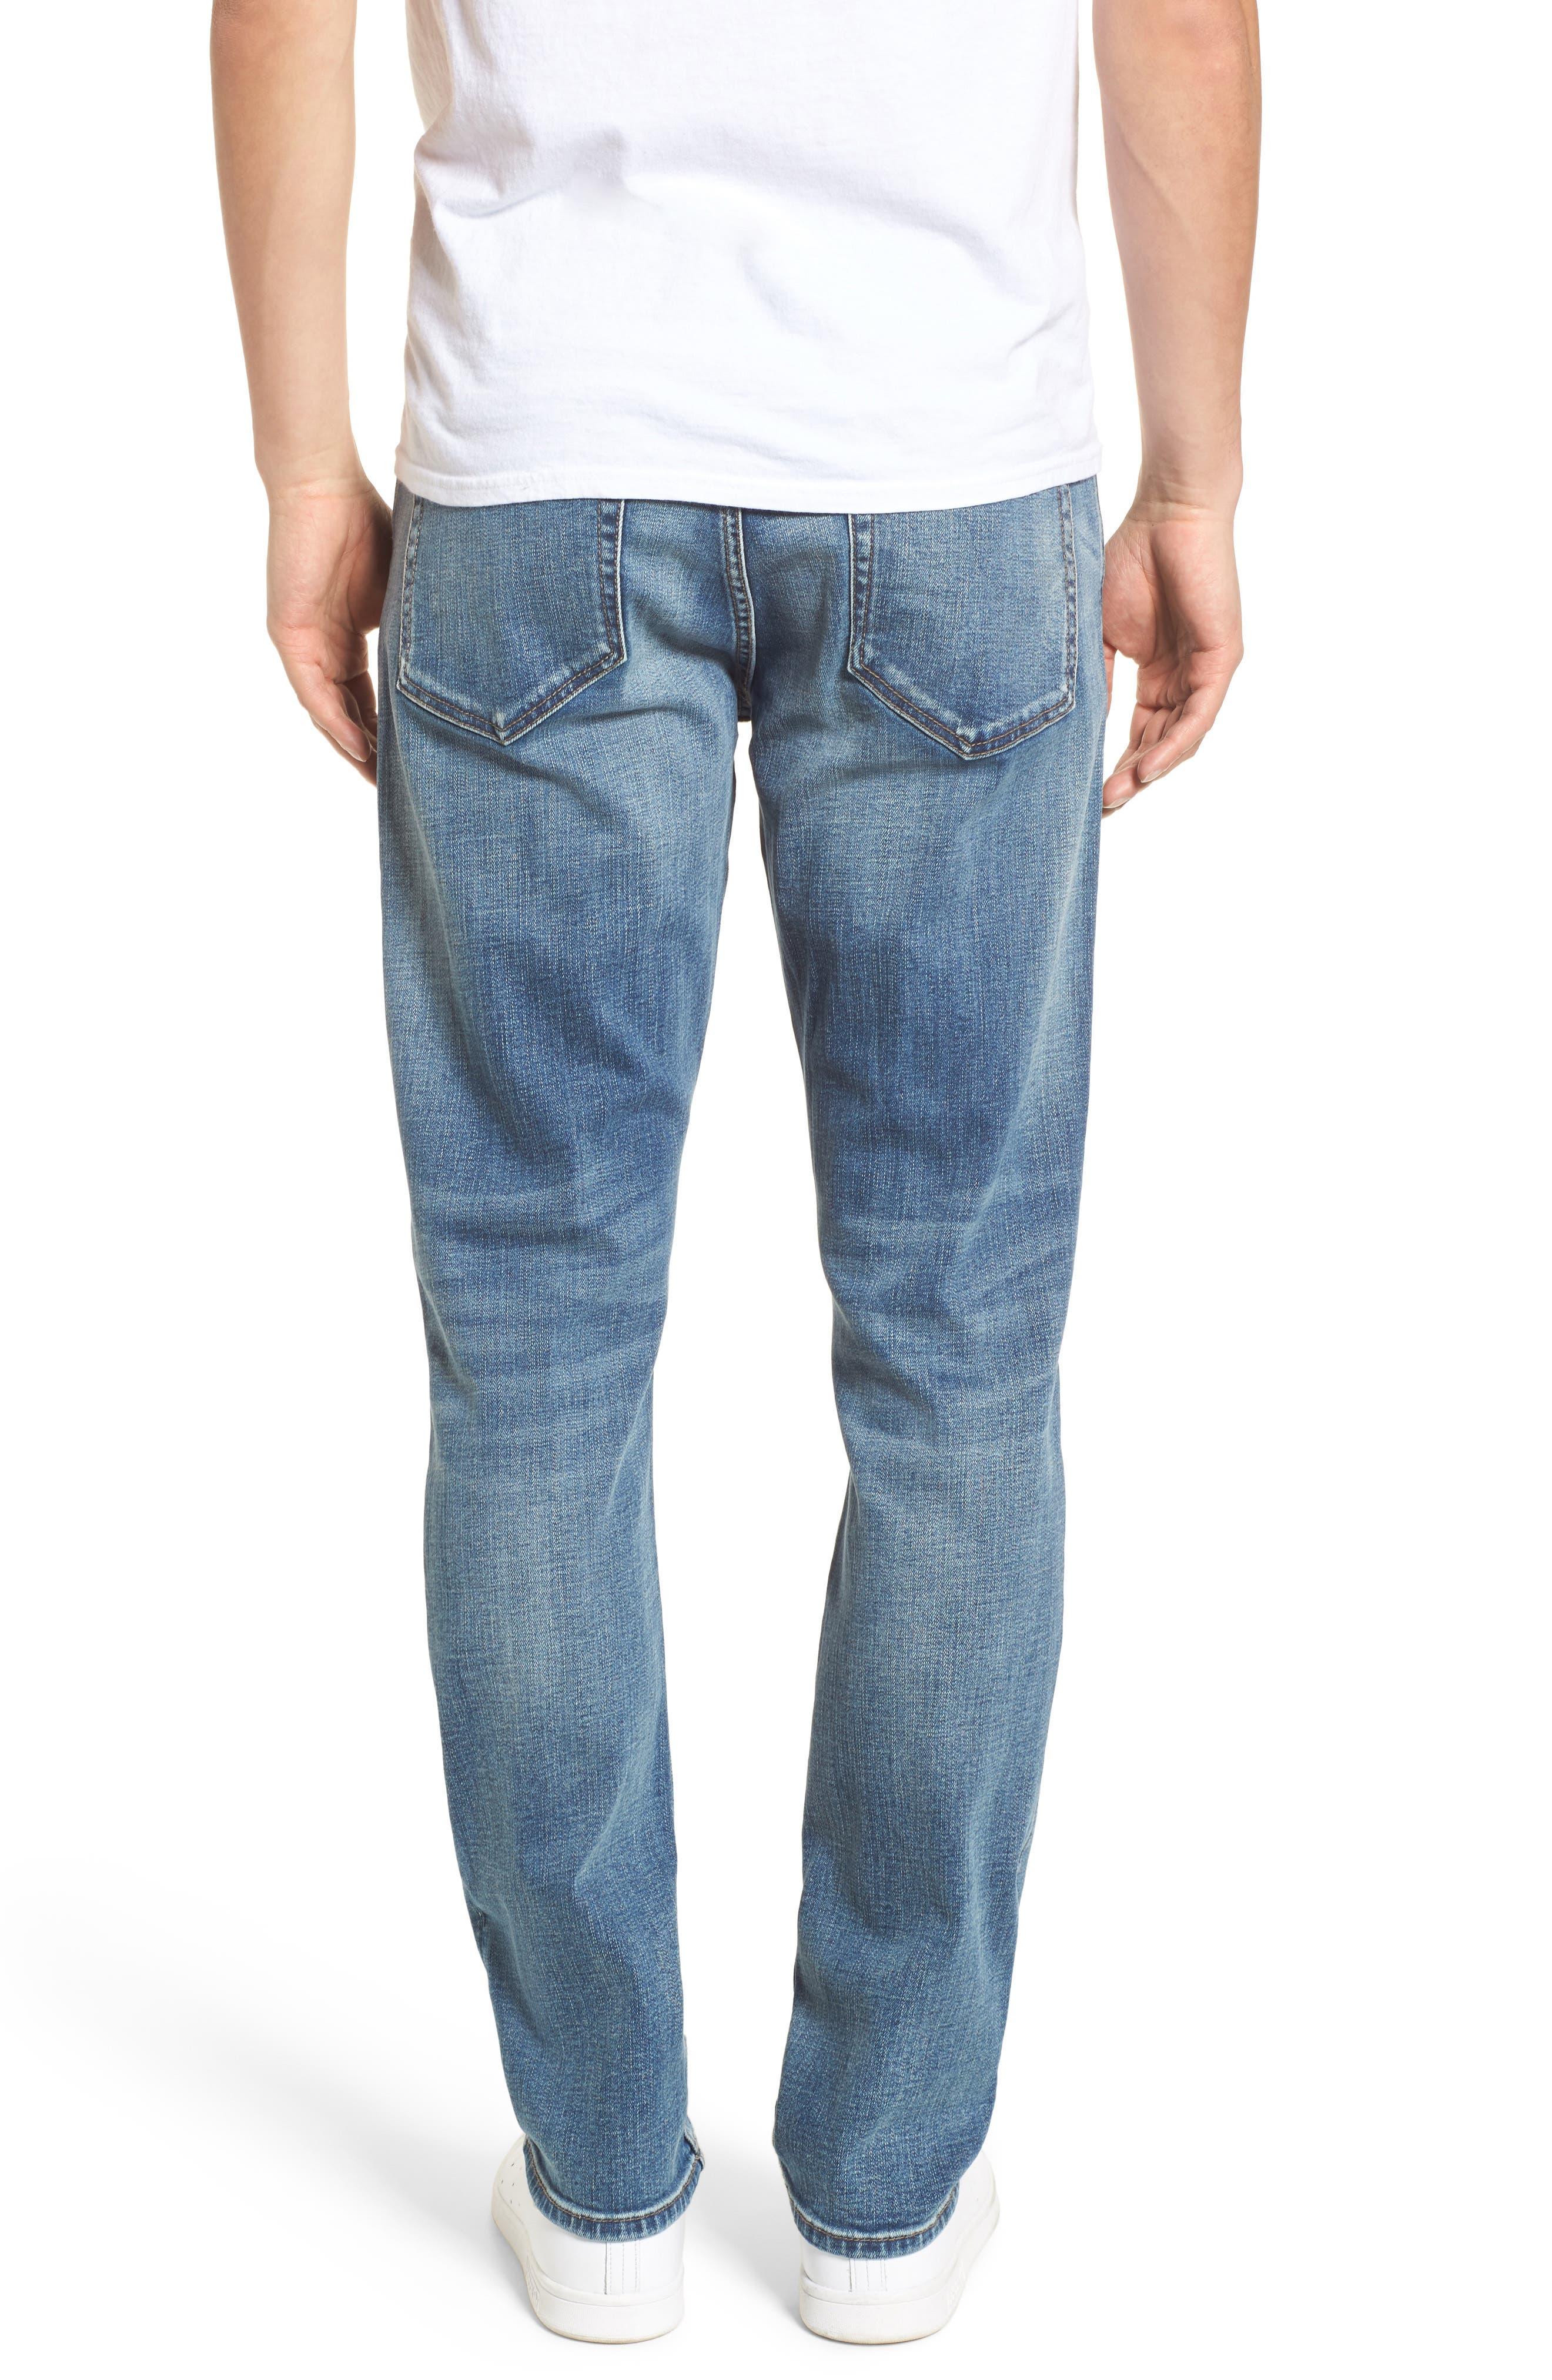 Wooster Slim Fit Jeans,                             Alternate thumbnail 2, color,                             400